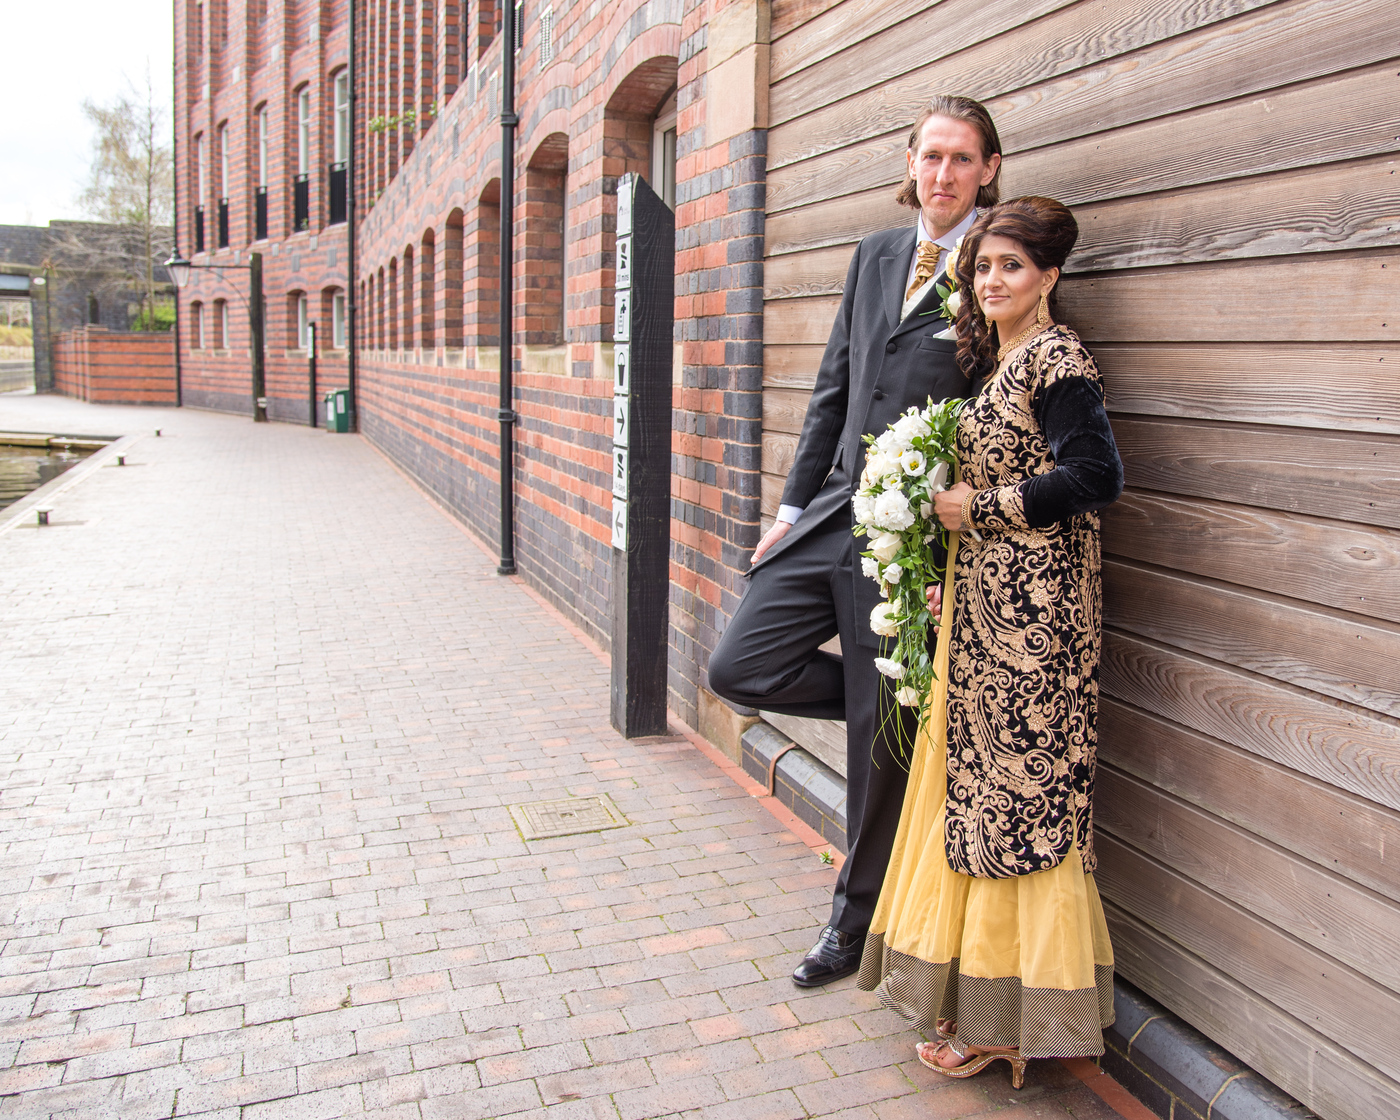 Birmingham wedding & afternoon tea!